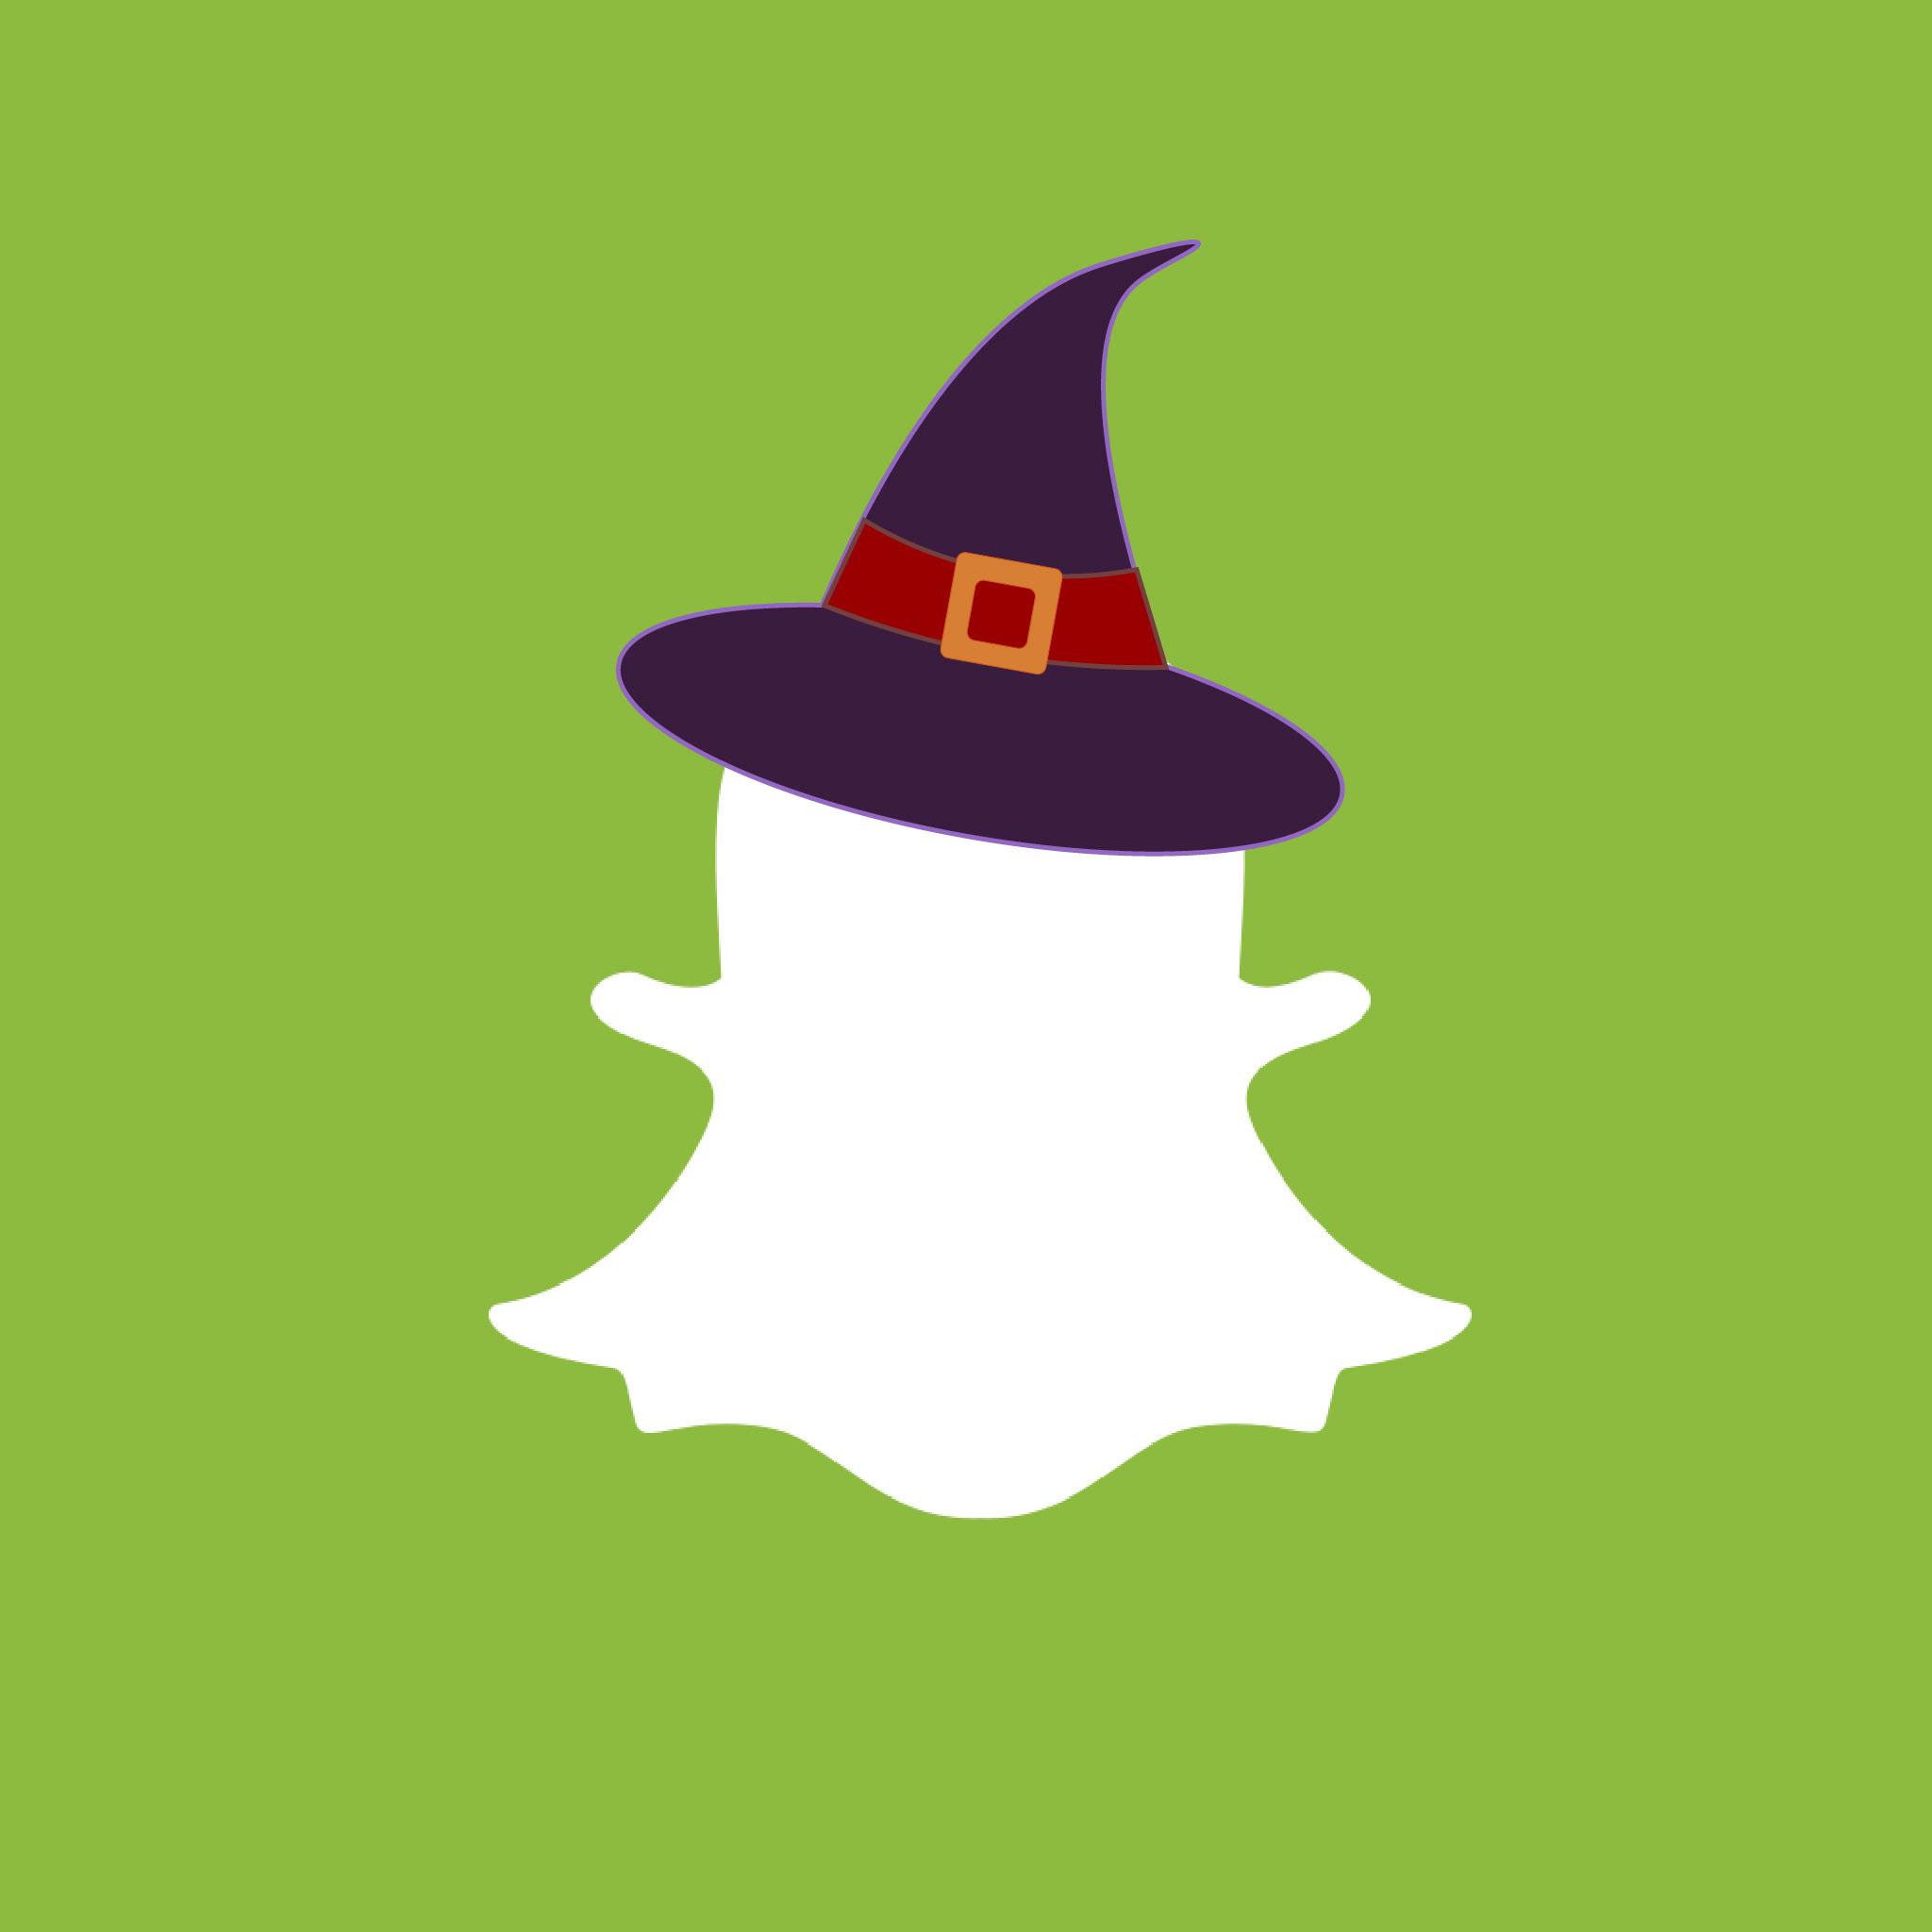 Snapchat Halloween App Icon from HalloweenCostumes.com